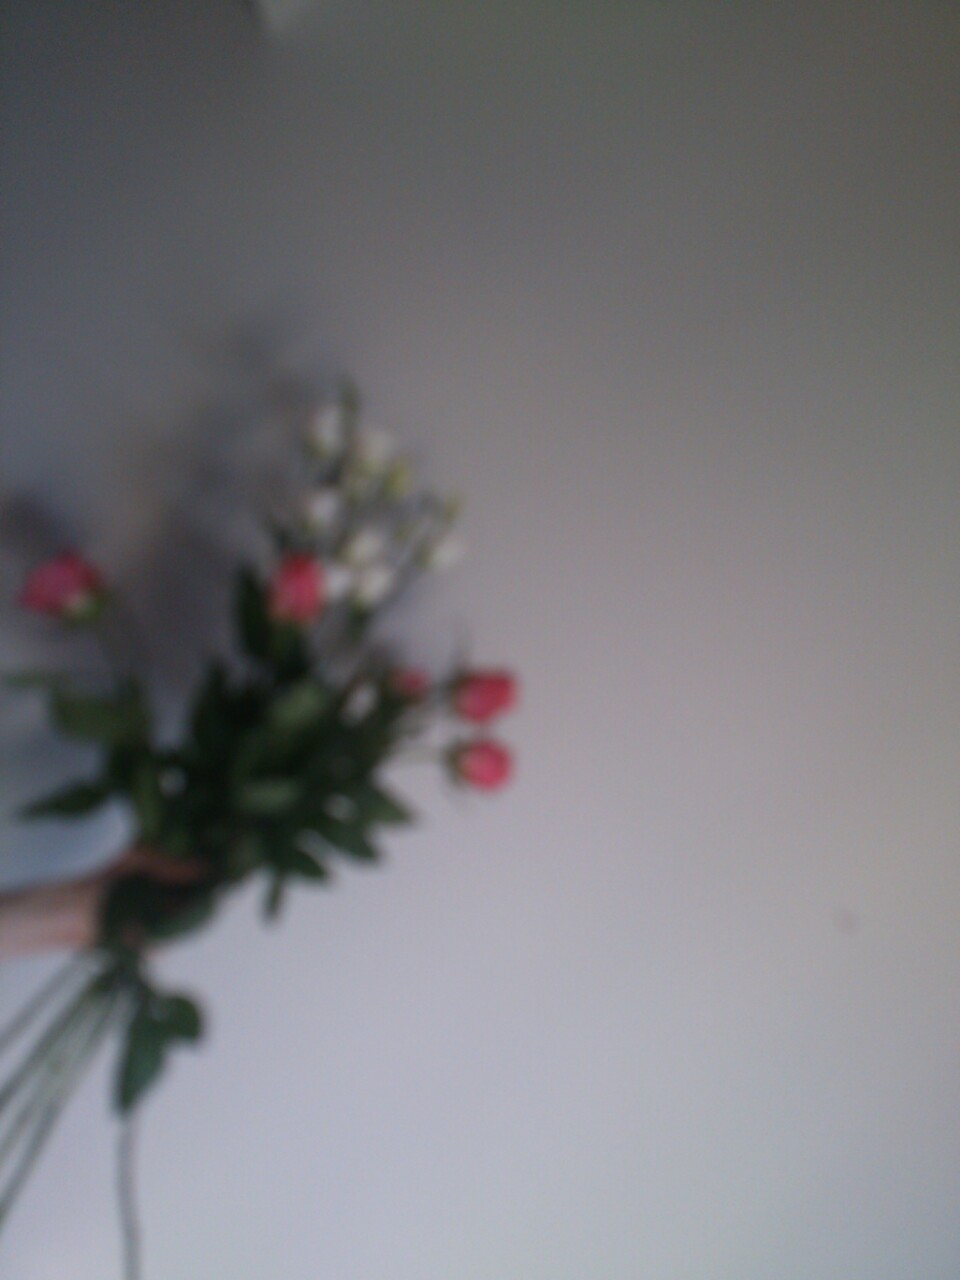 jade mellor flowers.jpg